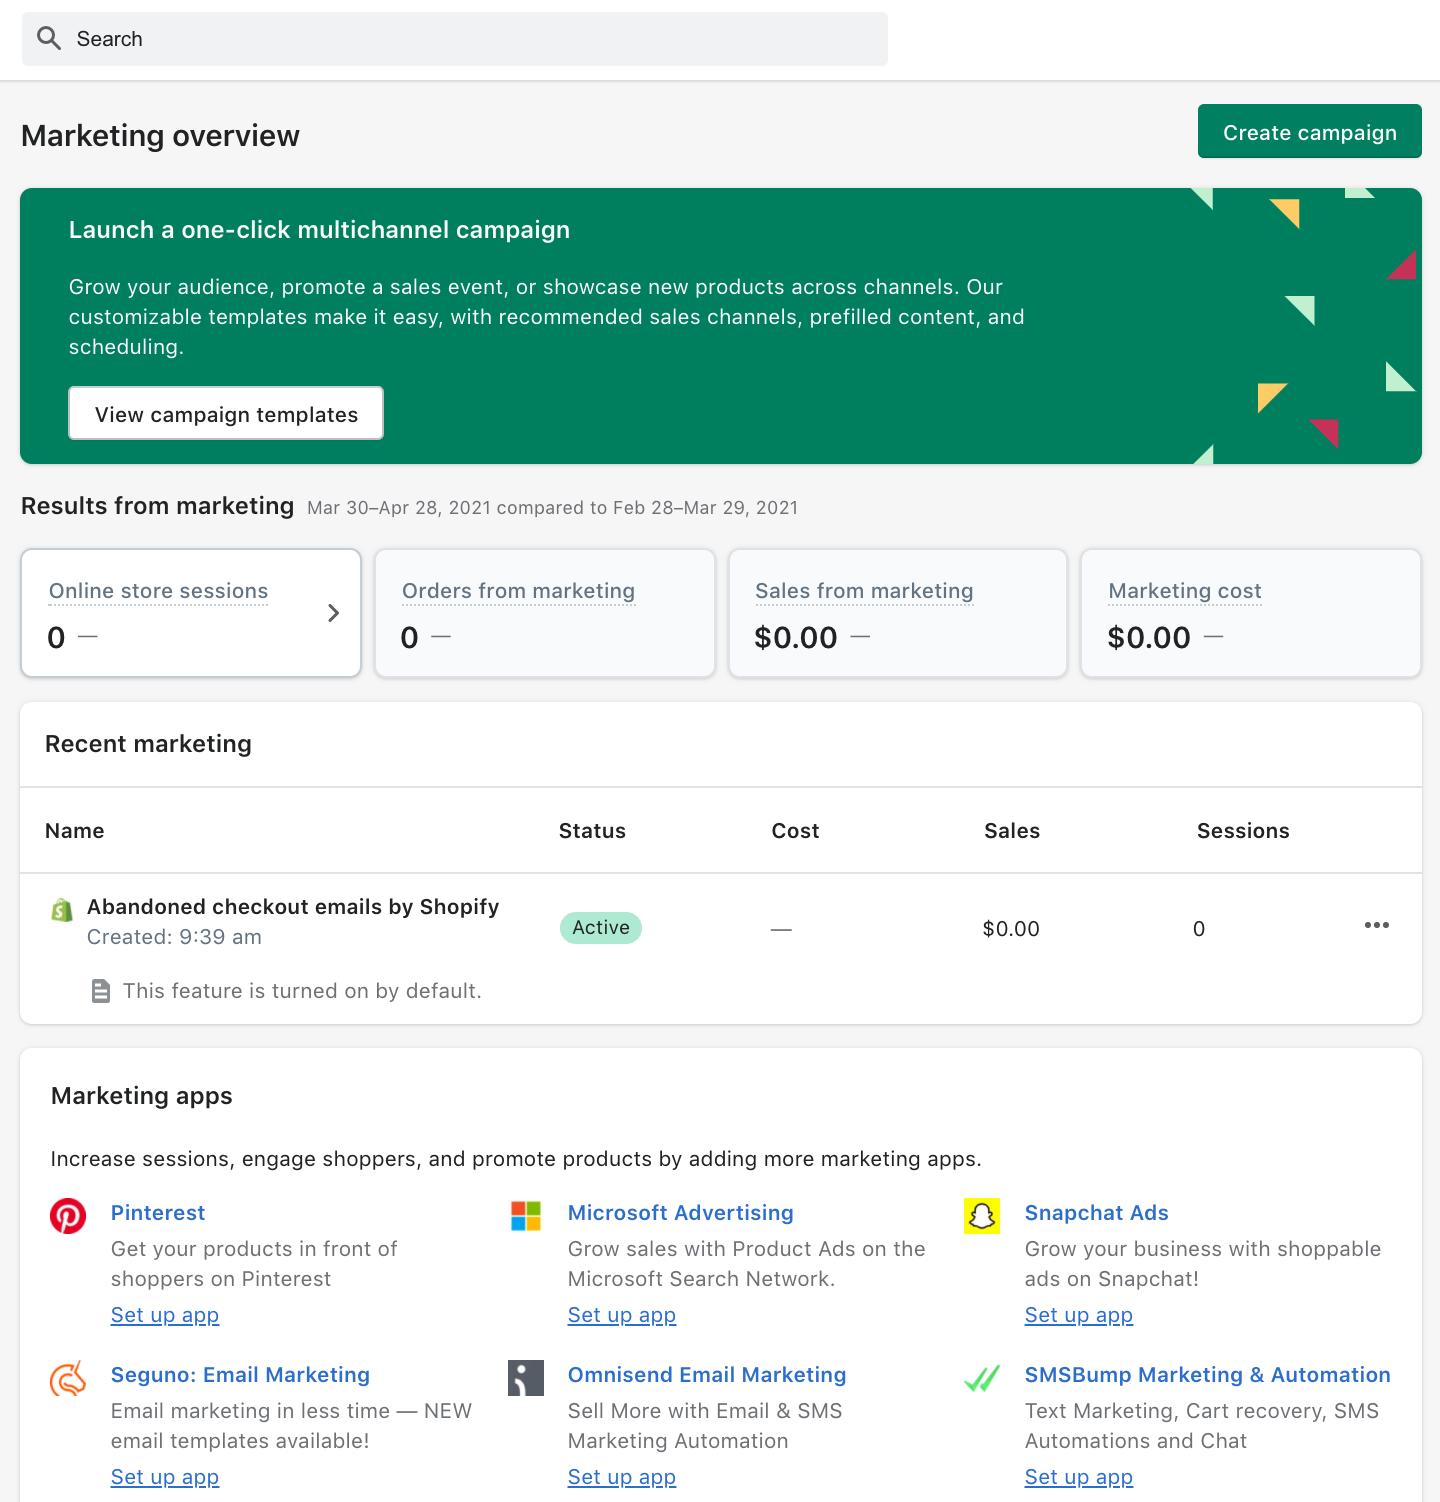 Using Shopify's Marketing Tools